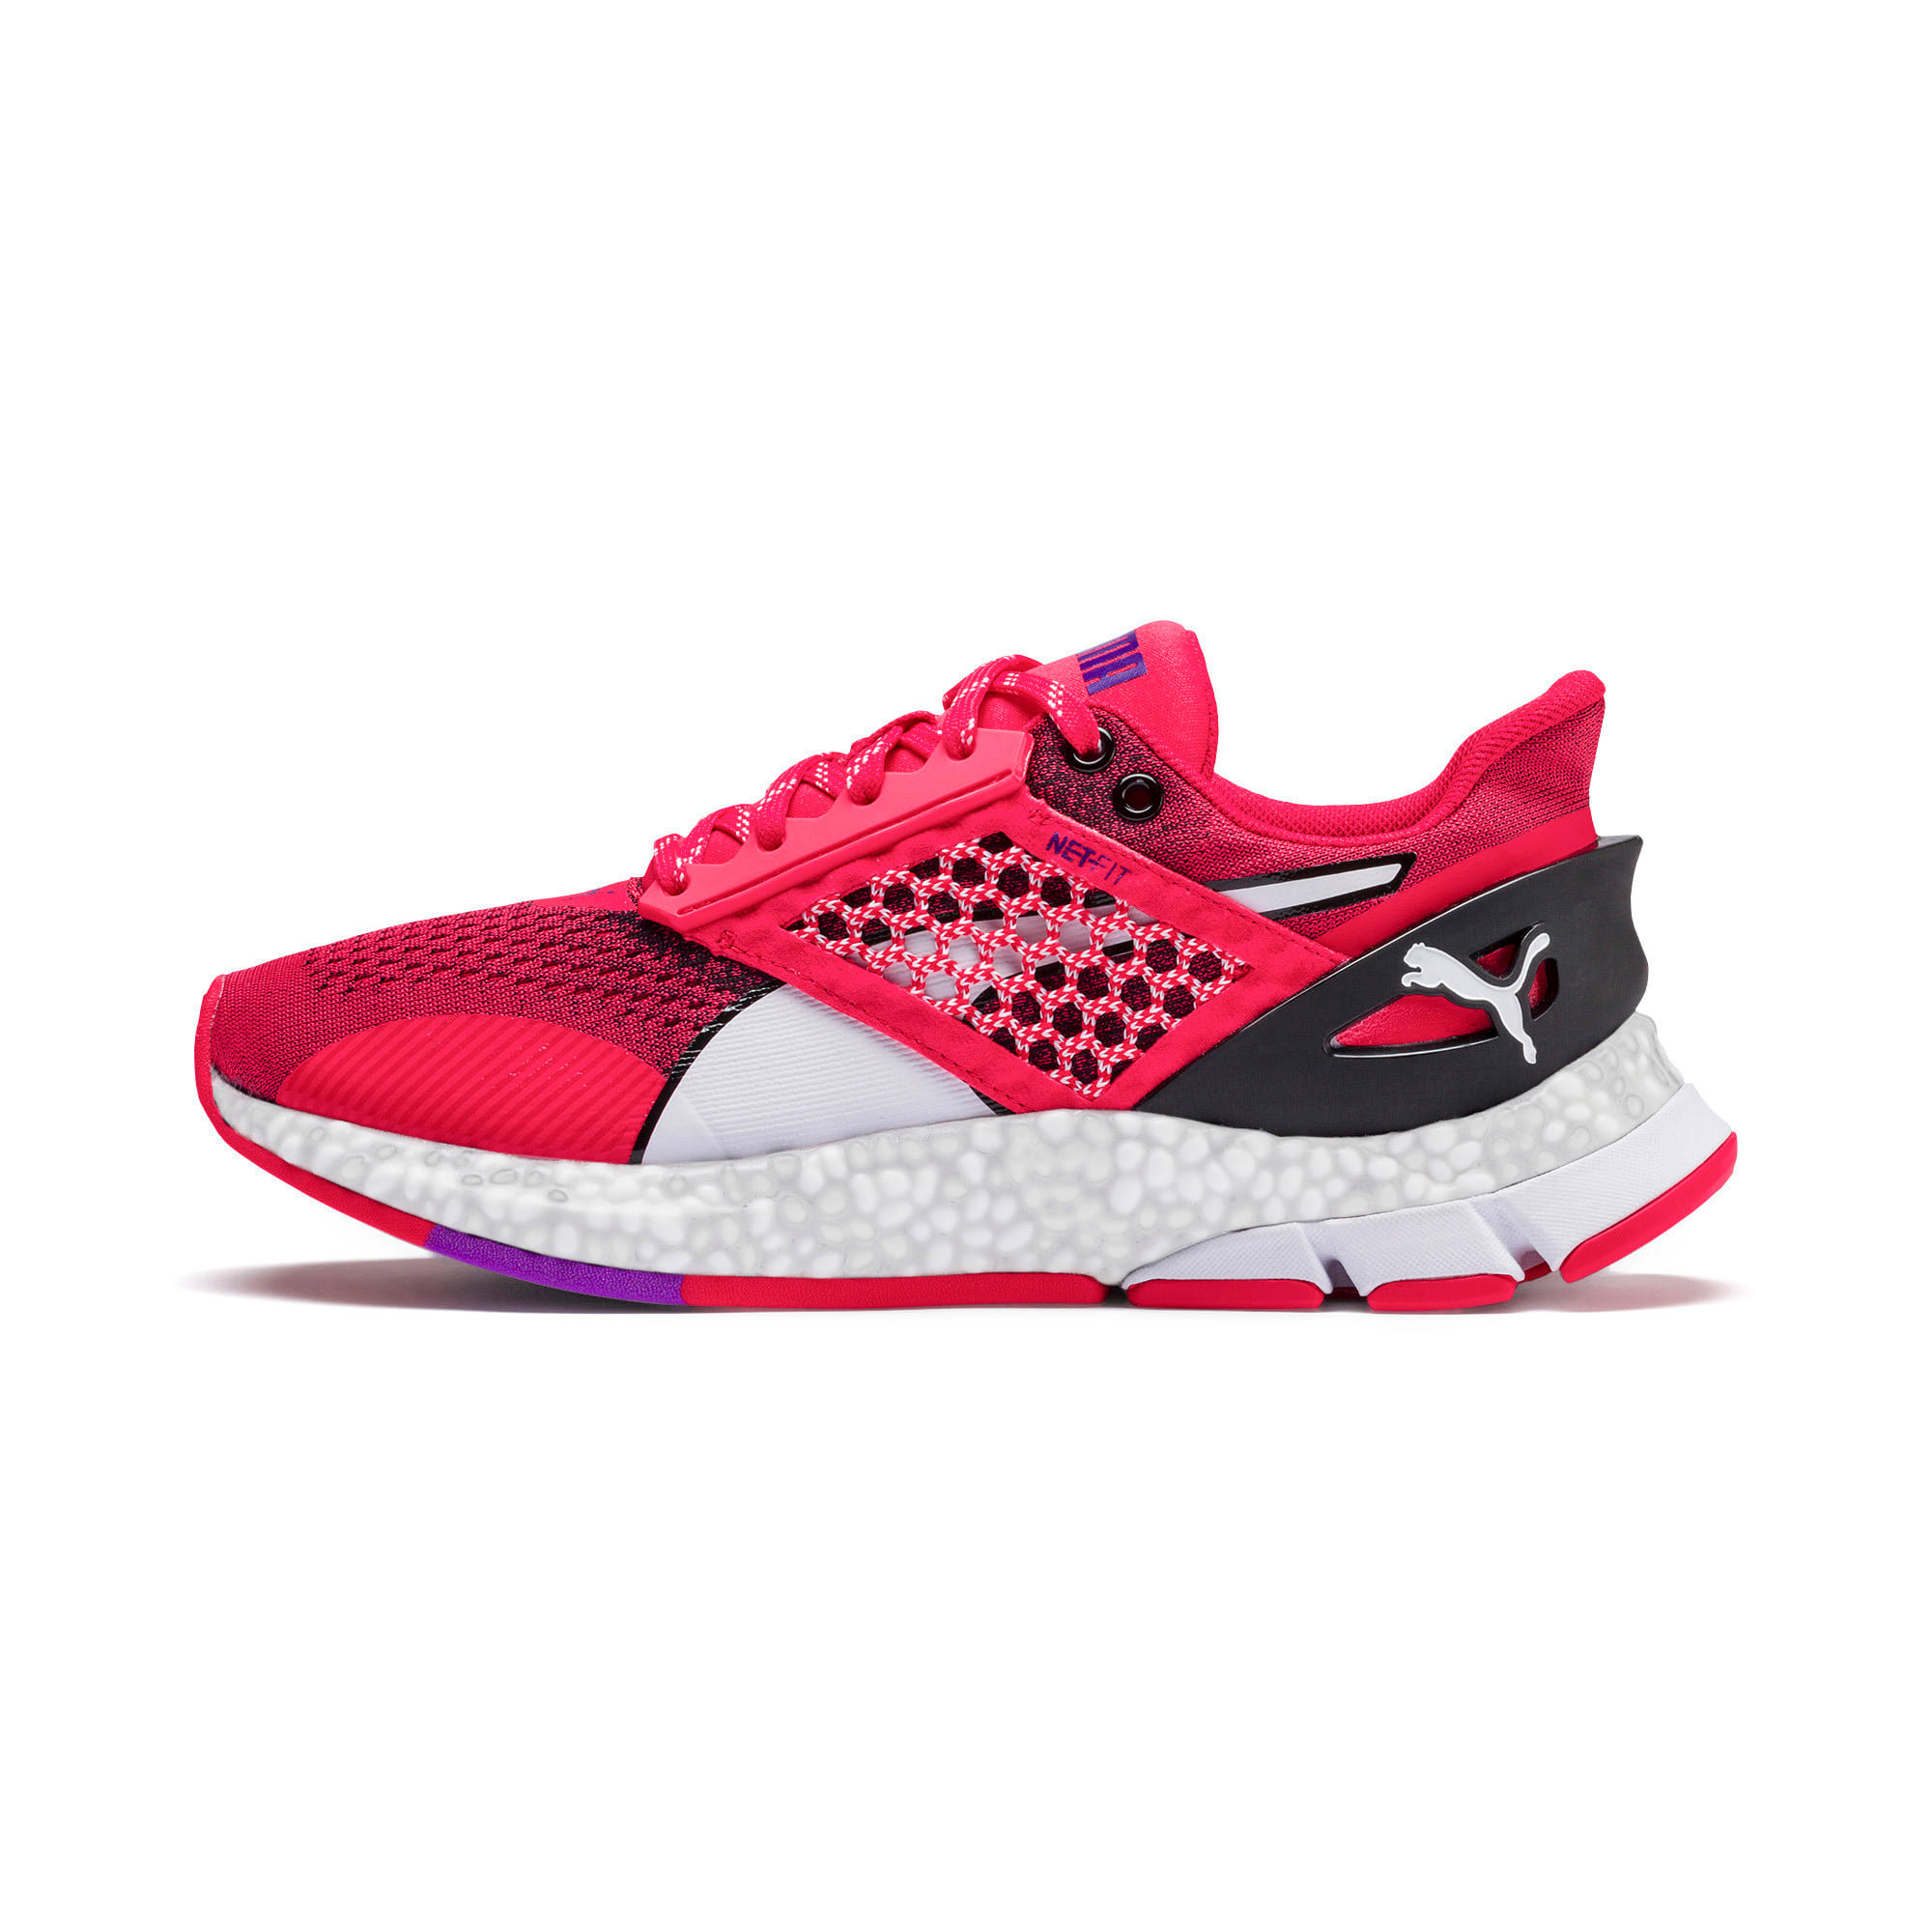 Thumbnail 1 of HYBRID Astro Women's Running Shoes, Nrgy Rose-Puma Black, medium